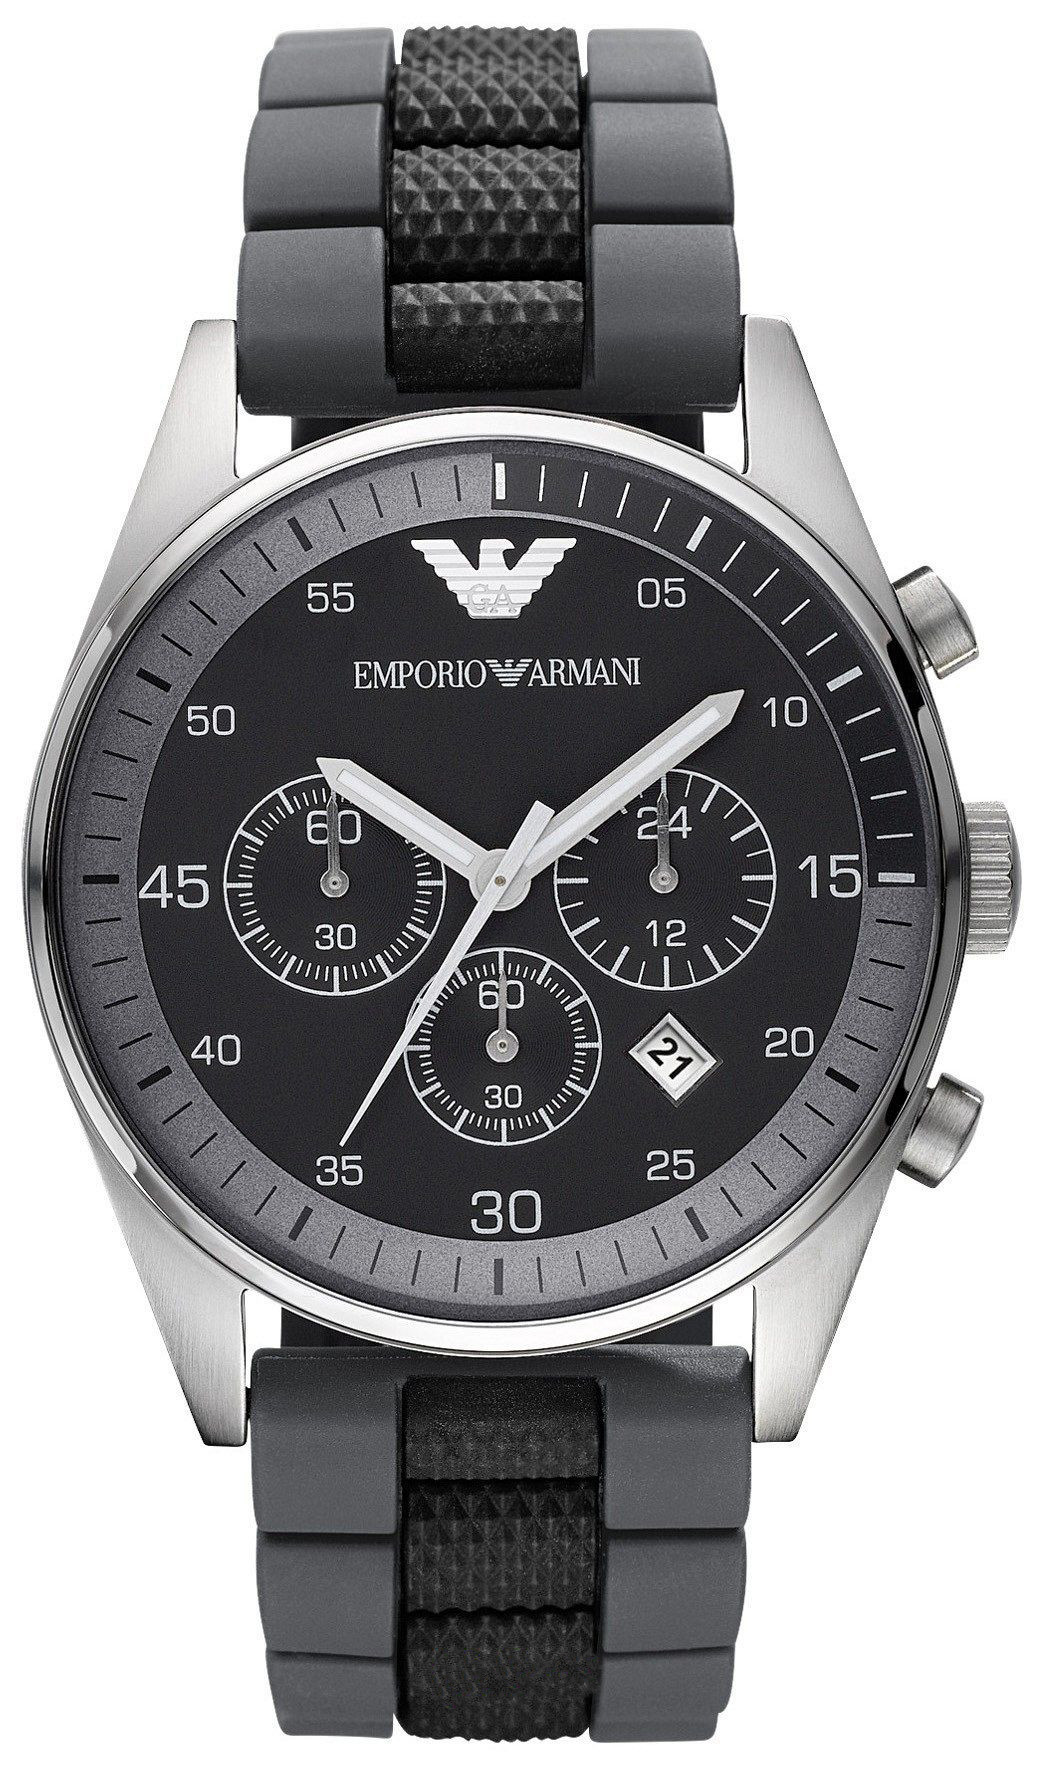 Emporio Armani Sportivo Gent's Stainless Steel Chronograph Watch AR2460